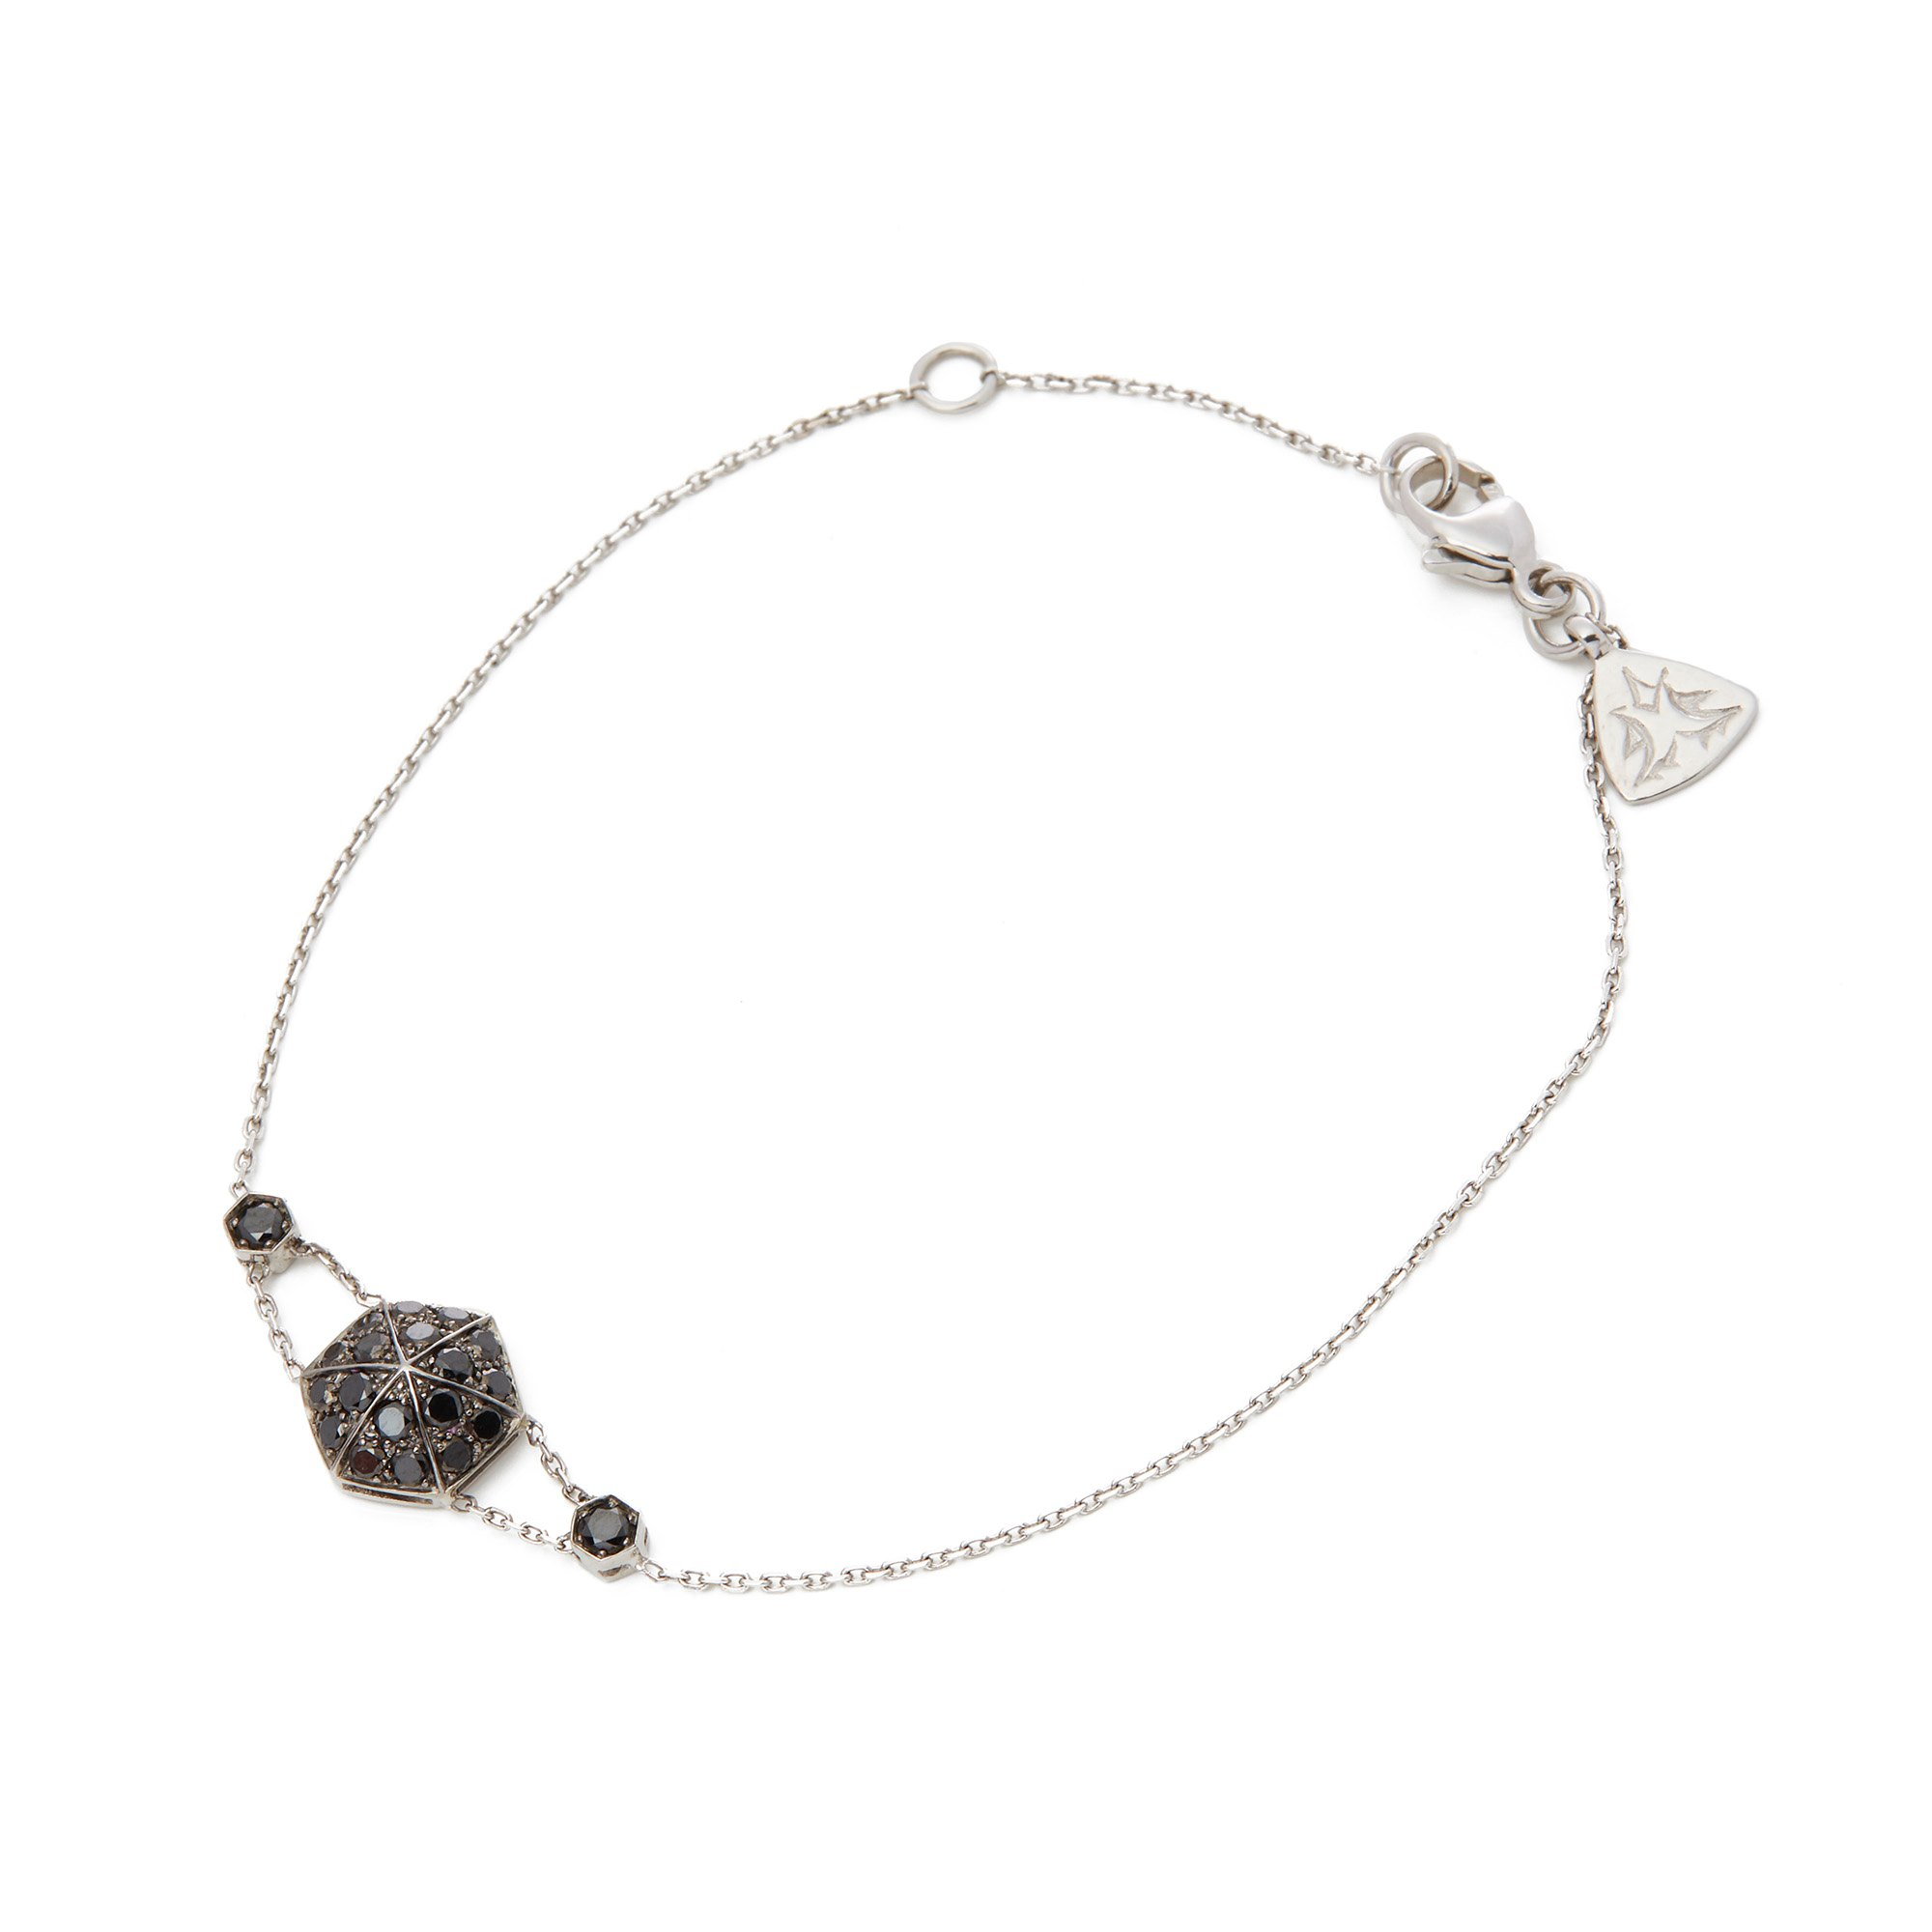 Stephen Webster 18k White Gold Black Diamond Pave Deco Bracelet